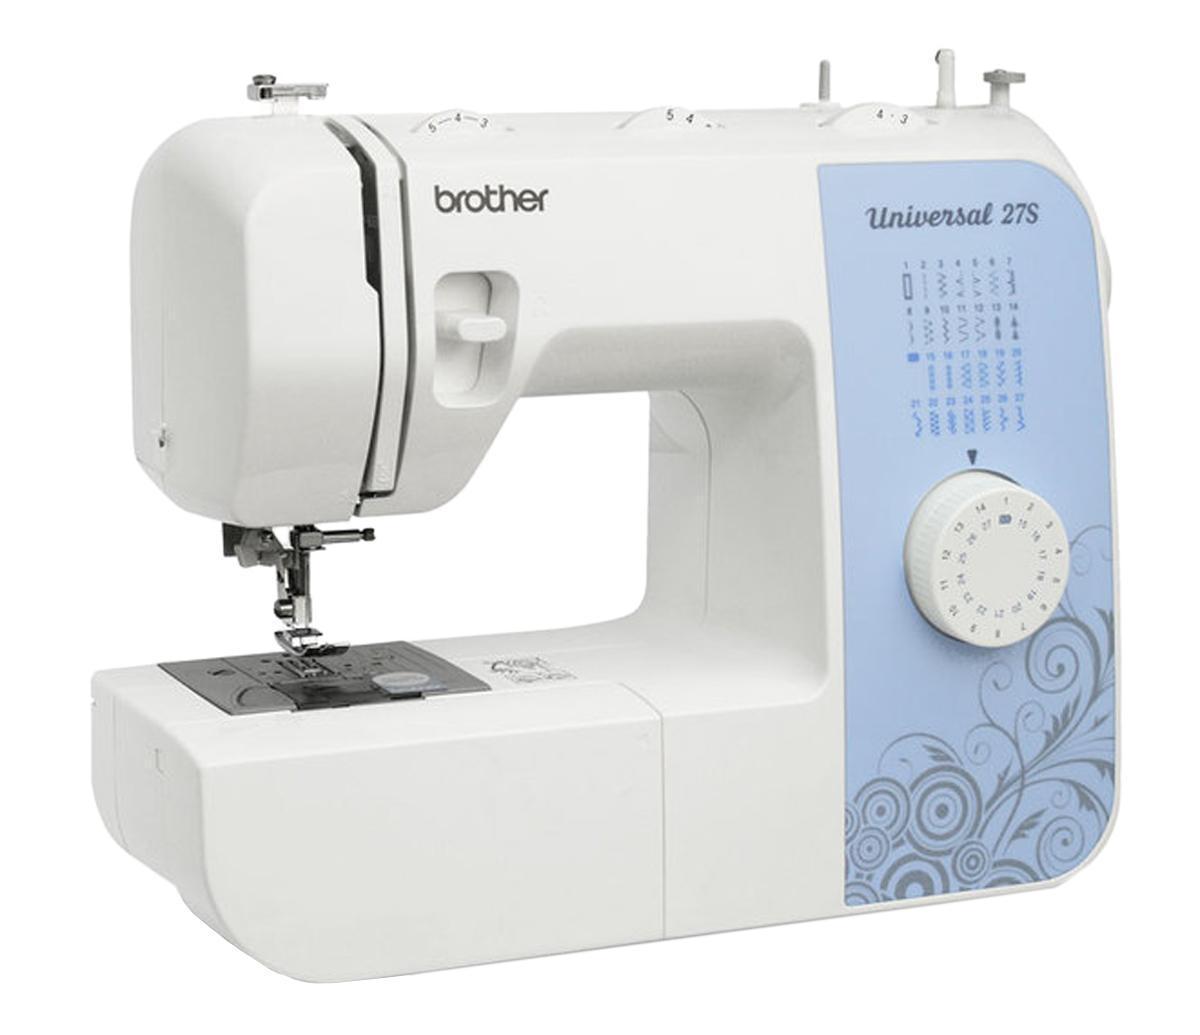 Brother Universal 27S швейная машина761435